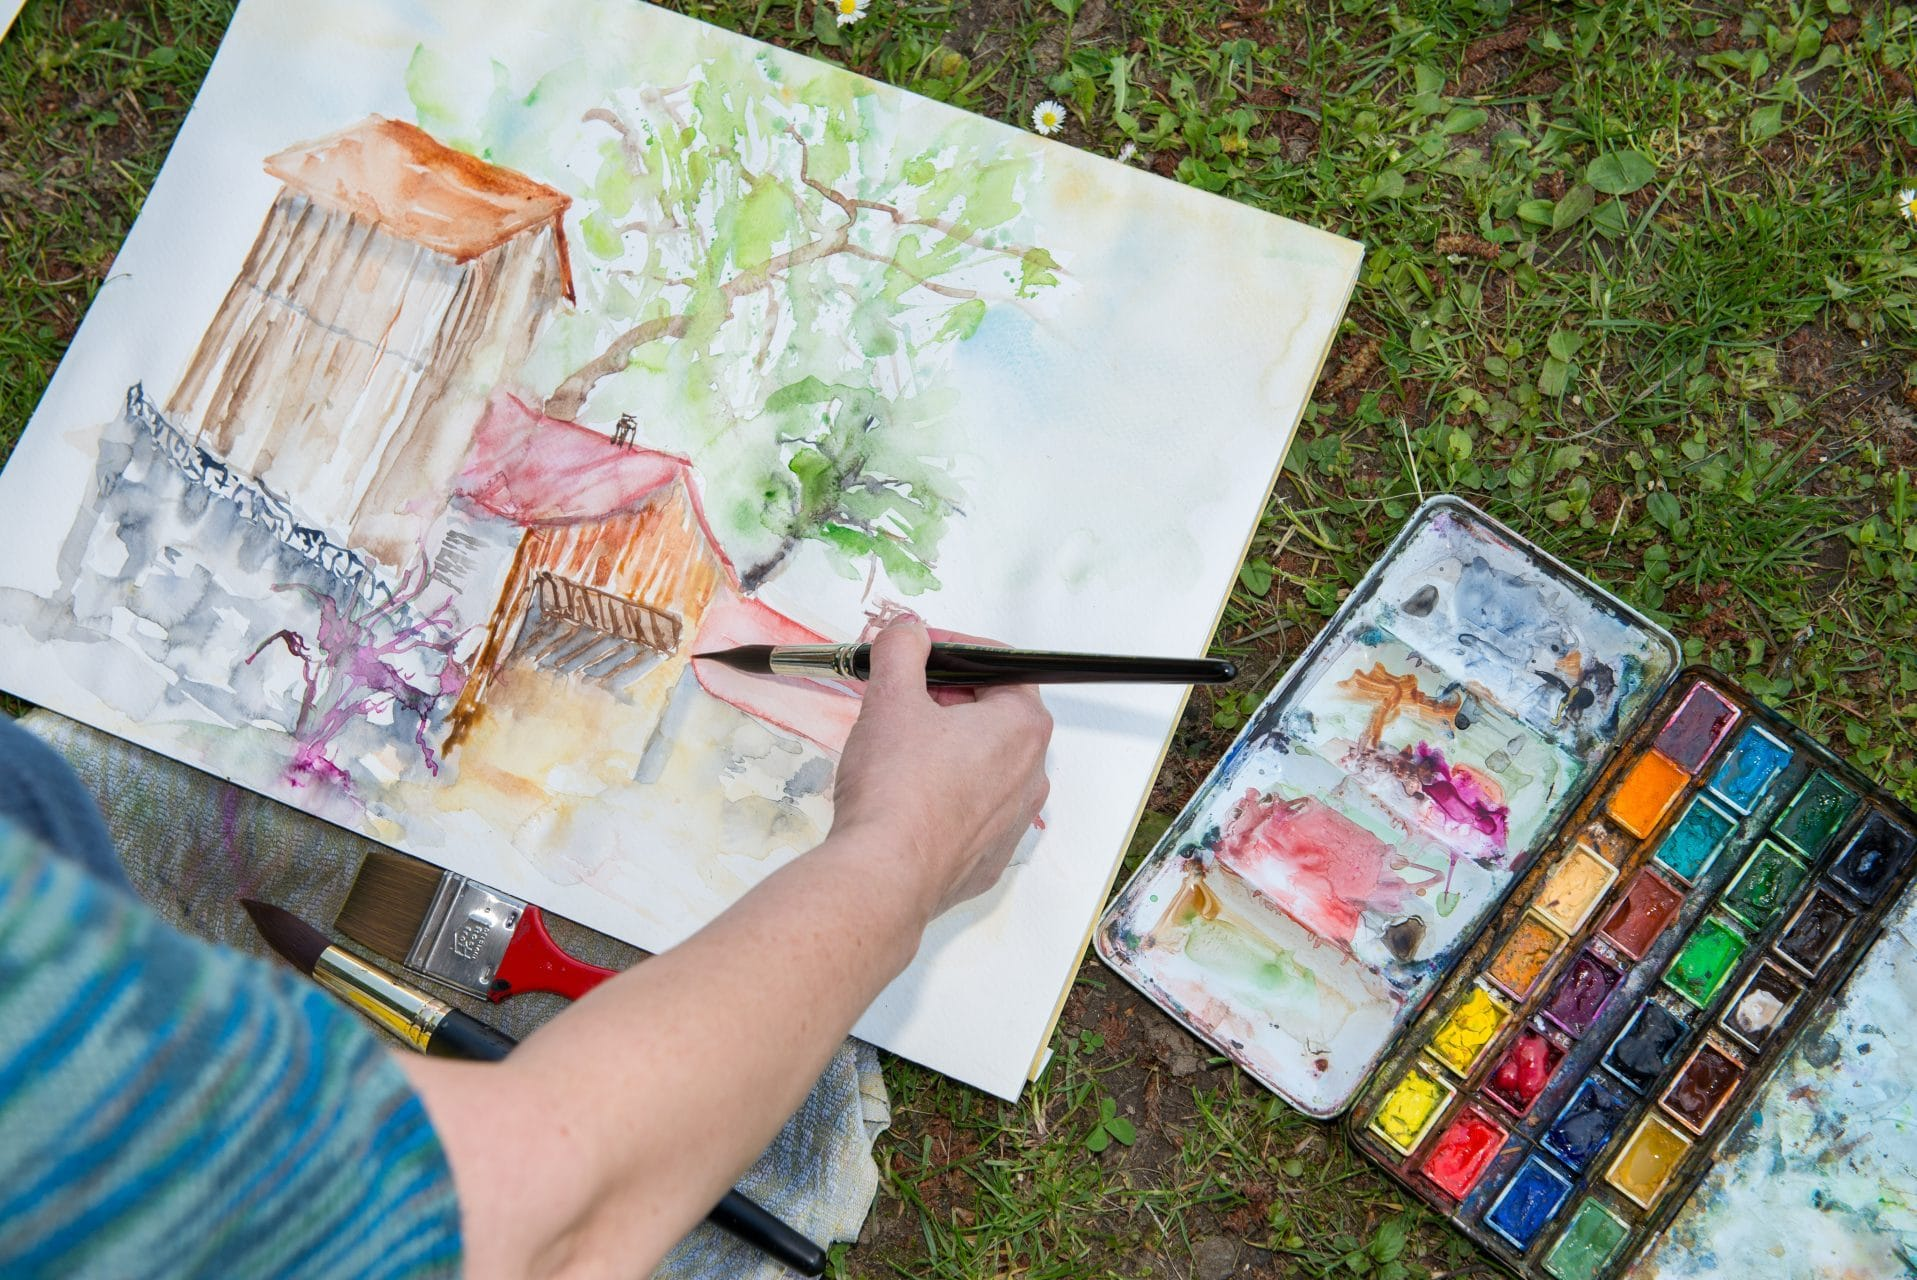 Styrian Summer Art Kunstpicknick ©Helmut Schweighofer